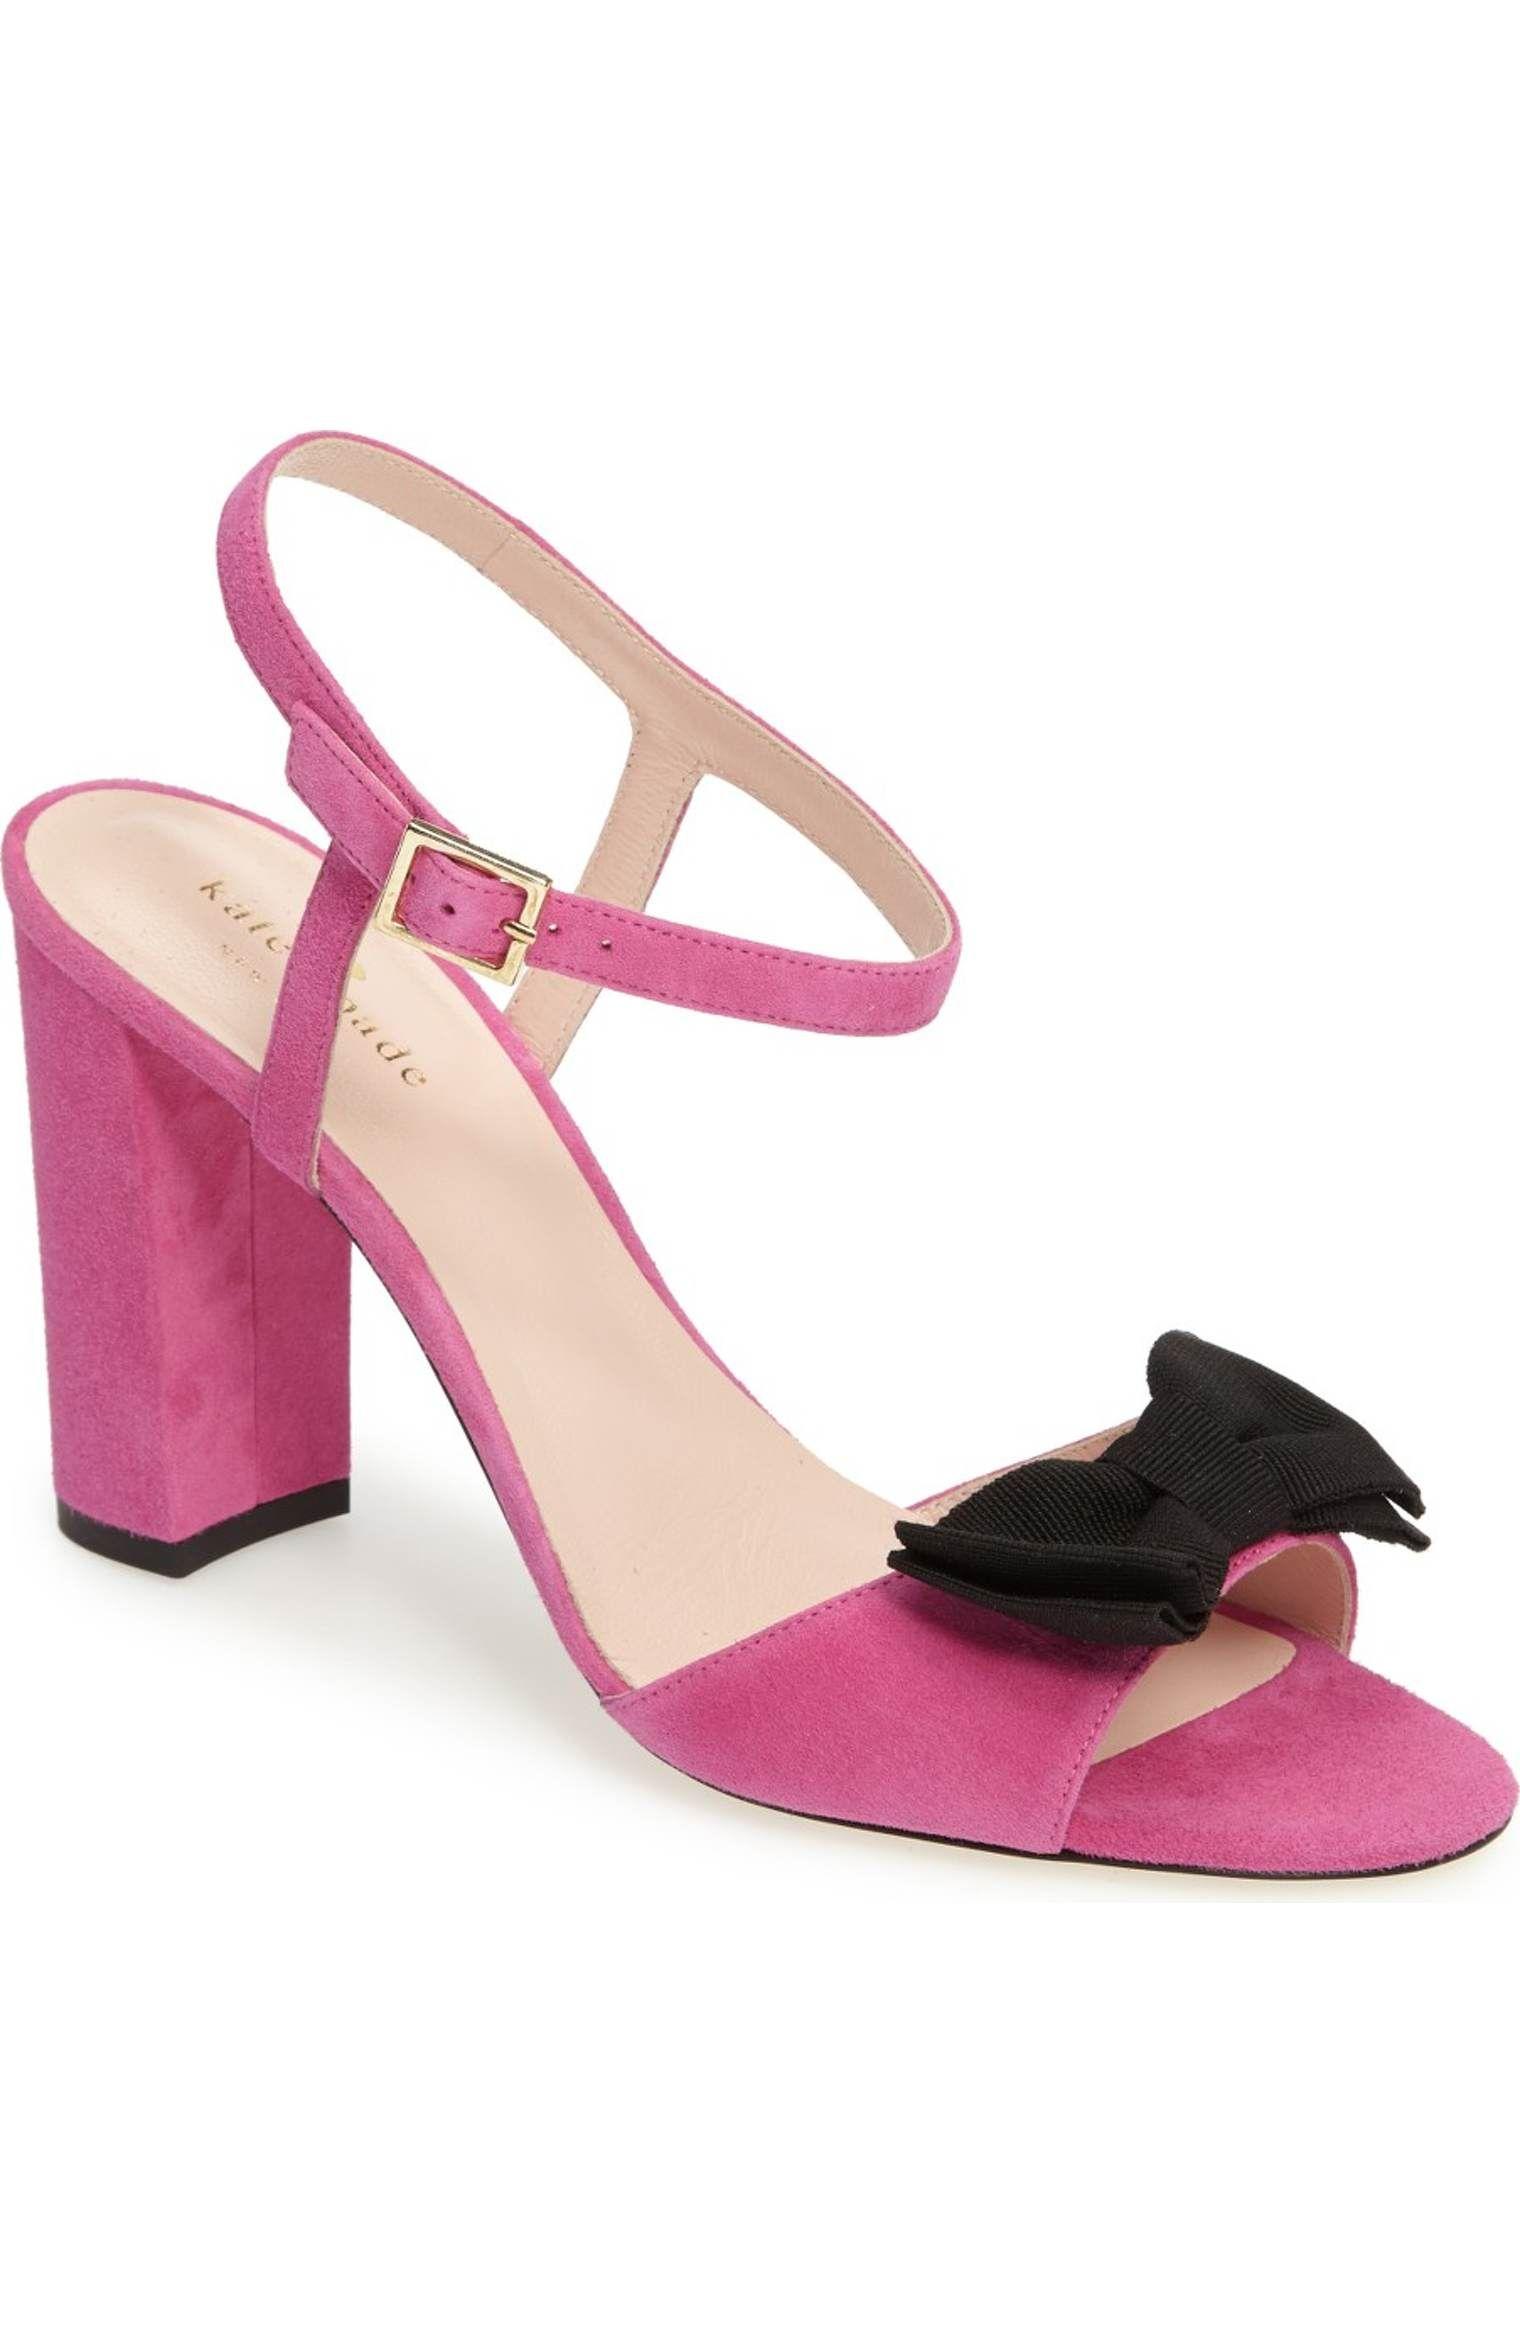 97971808e1cab Main Image - kate spade new york  isabel  patent sandal